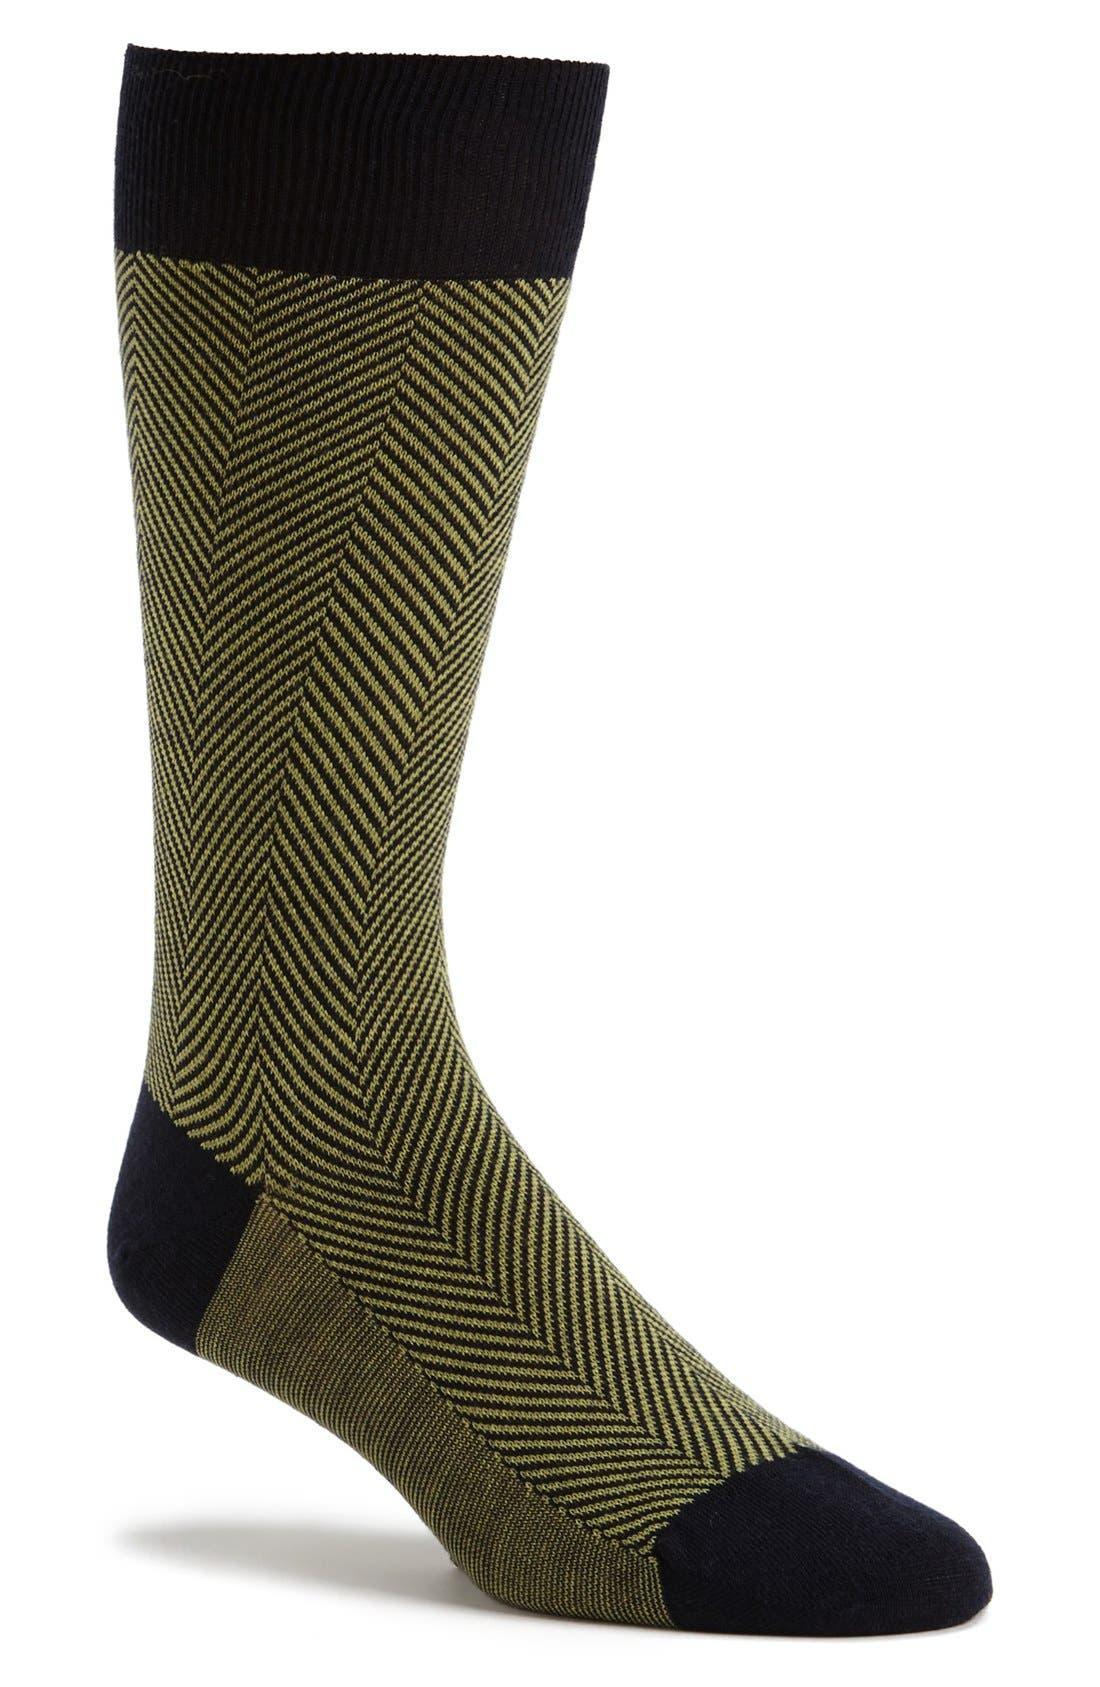 Main Image - Pantherella 'Hoxton' Herringbone Socks